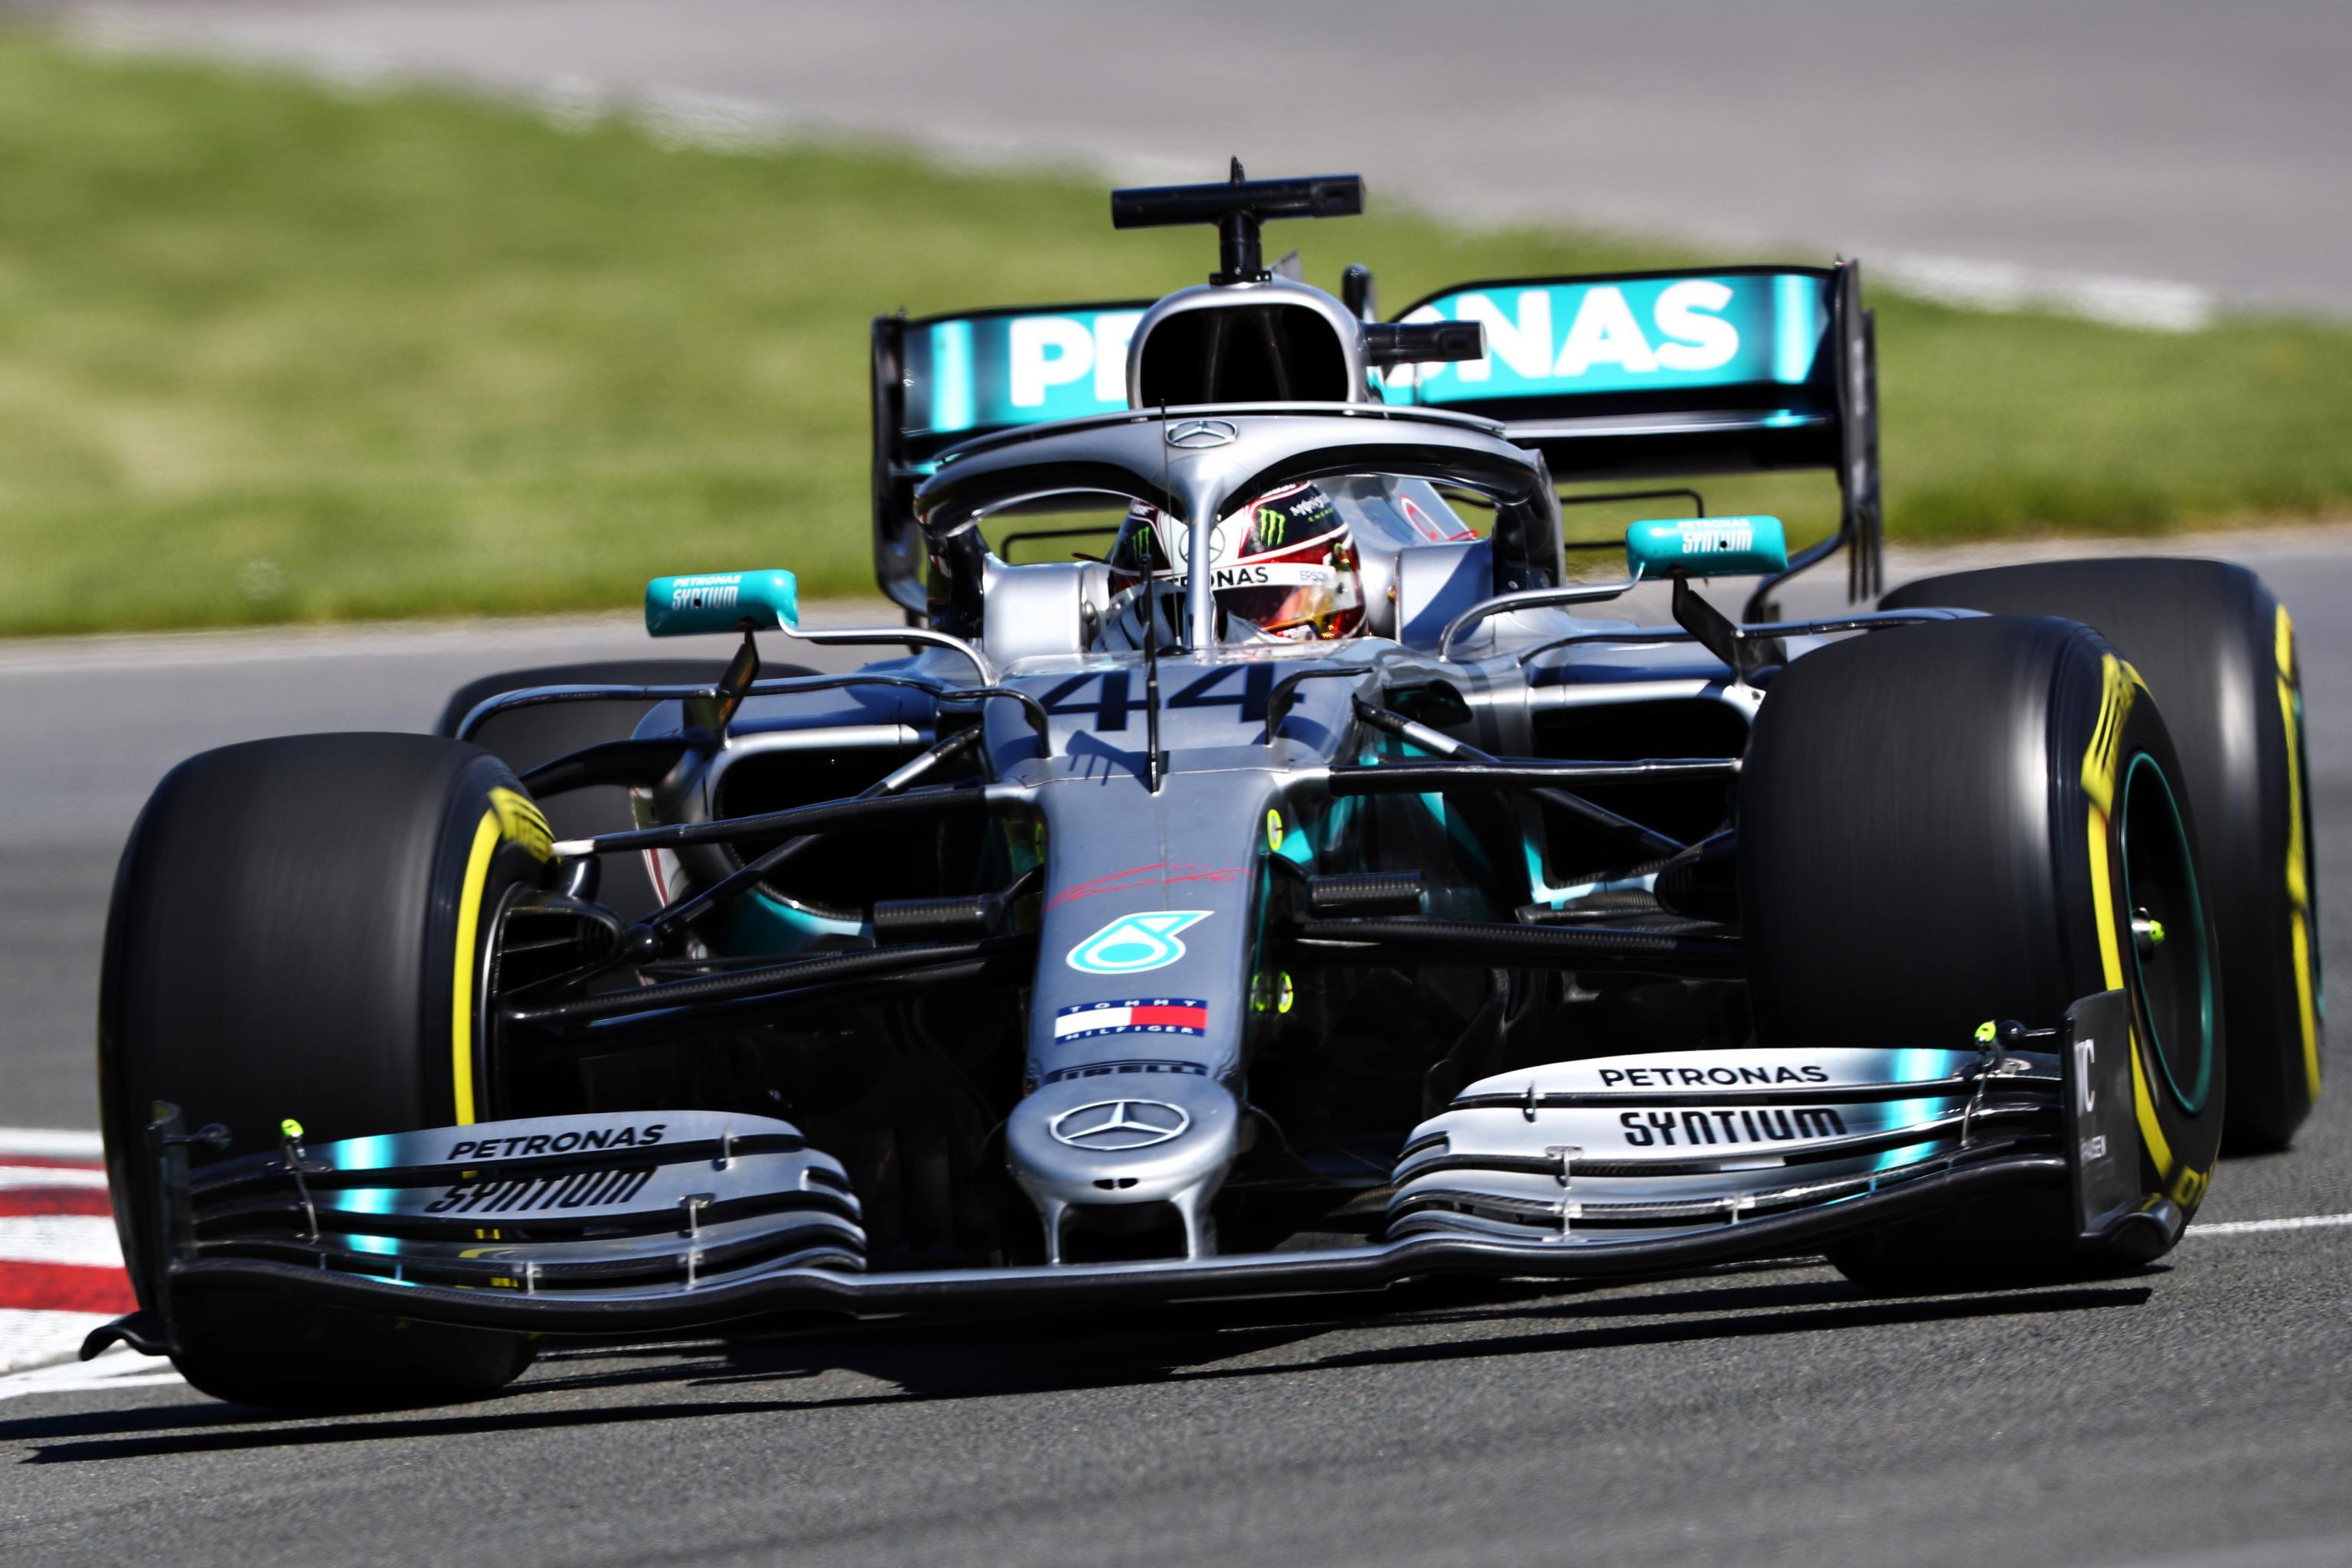 Canadian F1 Grand Prix 2019: Start Time, Drivers, TV